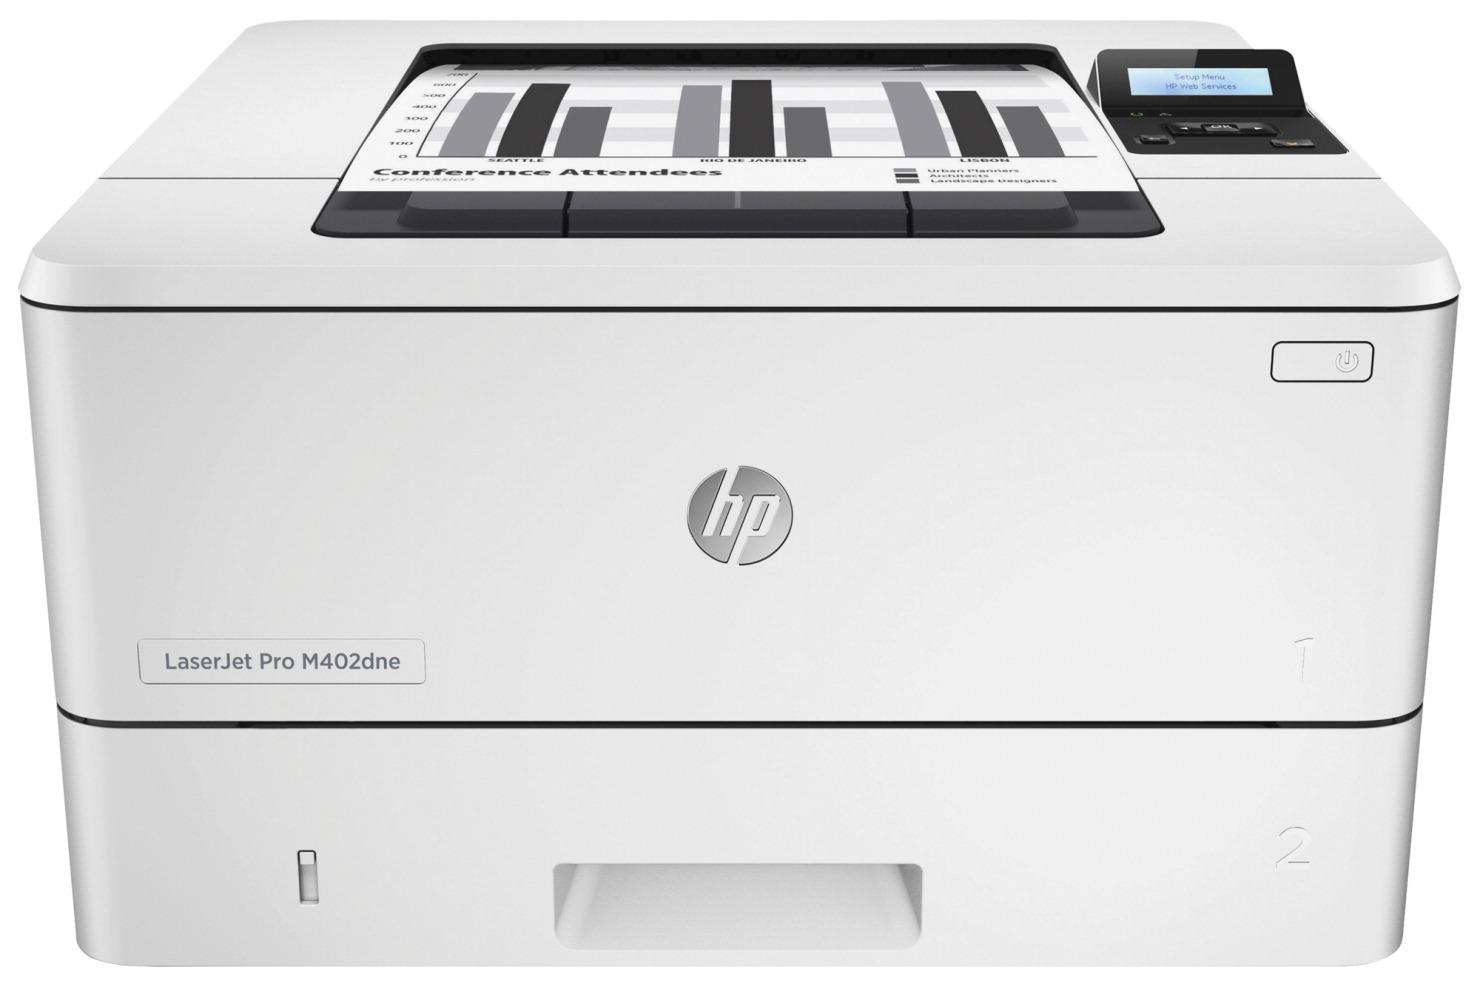 HP LaserJet Pro Printer, 40PPM, 256MB DRAM Memory, White - SCHOOL ...